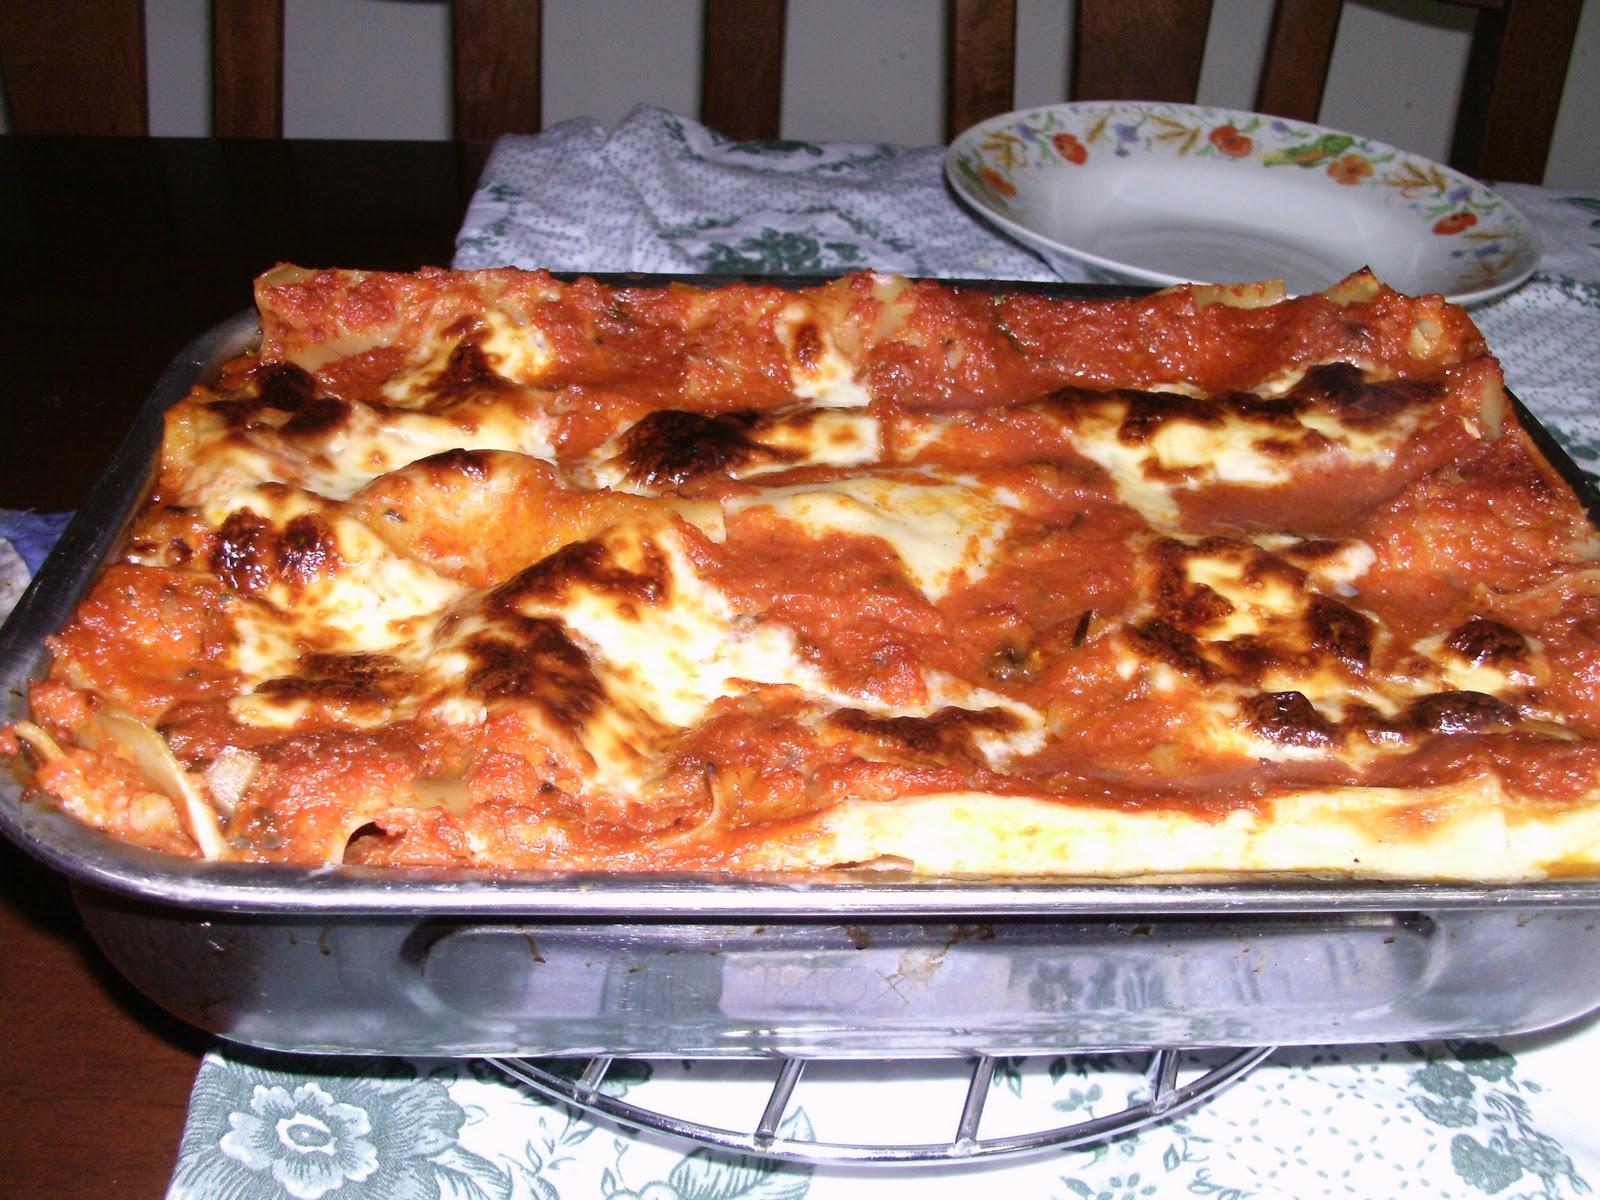 Cosa cucino oggi lasagne quasi vegetariane - Cosa cucino oggi a pranzo ...